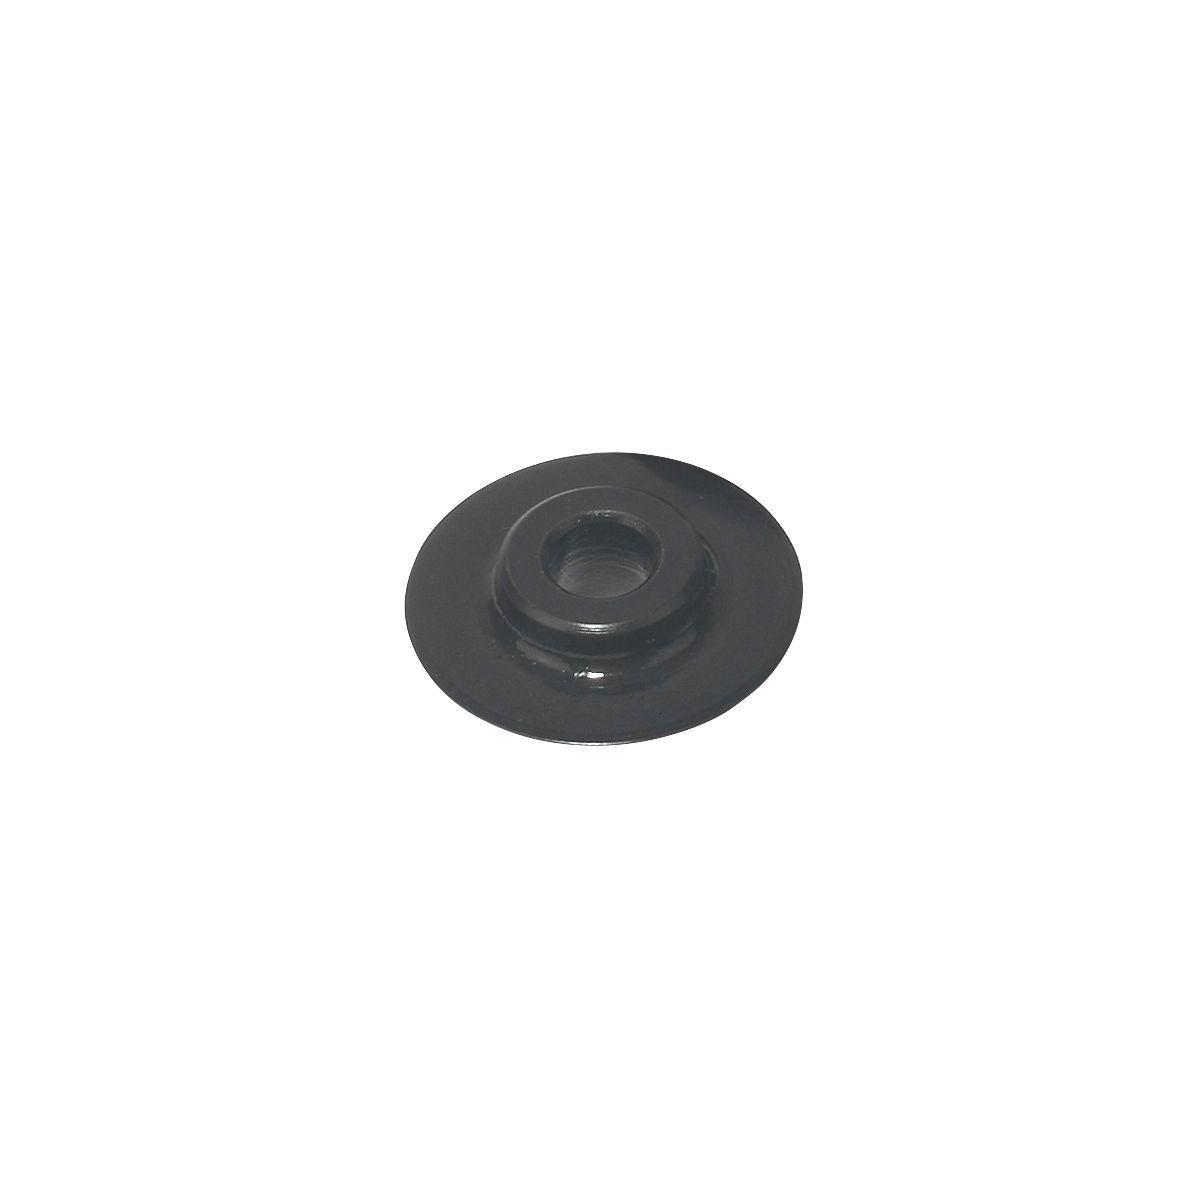 Rothenberger 70017 Cutting Wheel